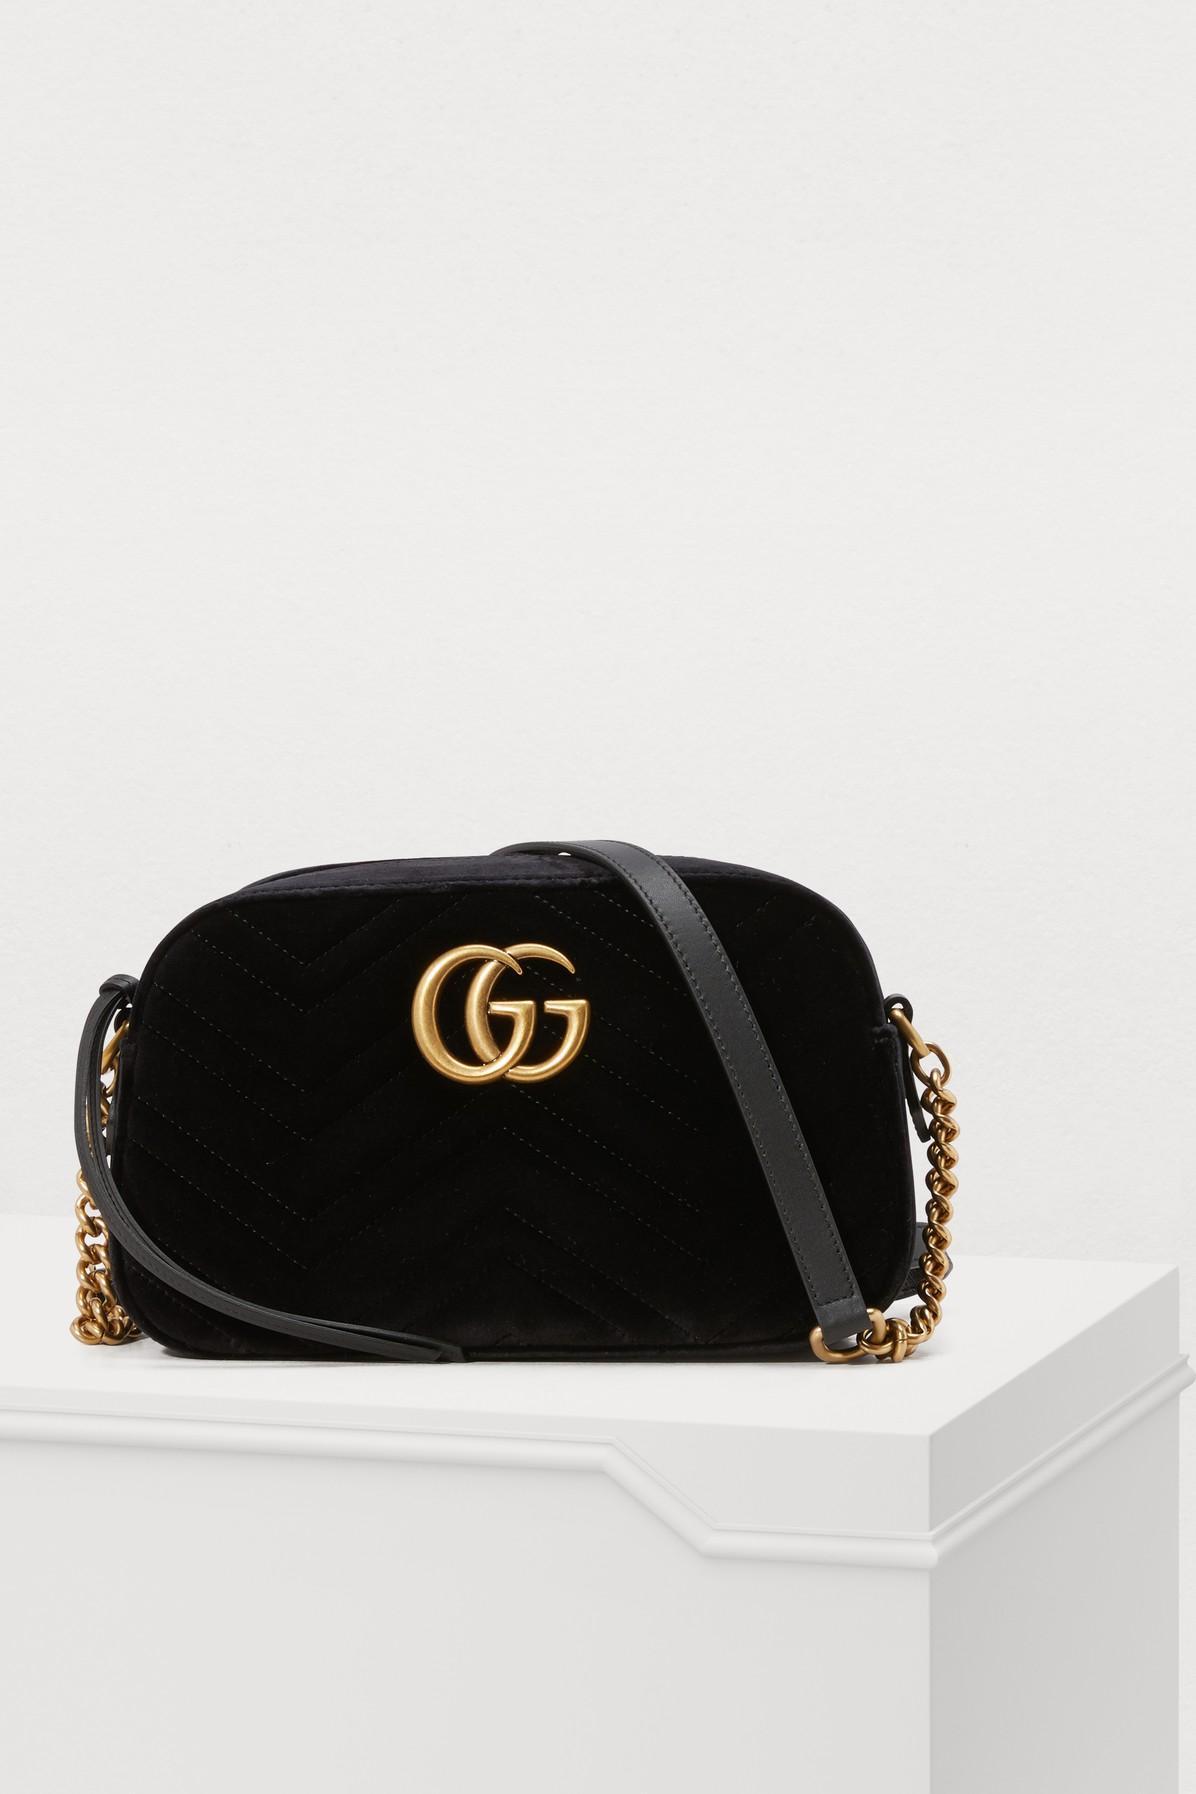 0c392d013ce Gucci Gg Marmont Velvet Camera Bag In 1000 Black